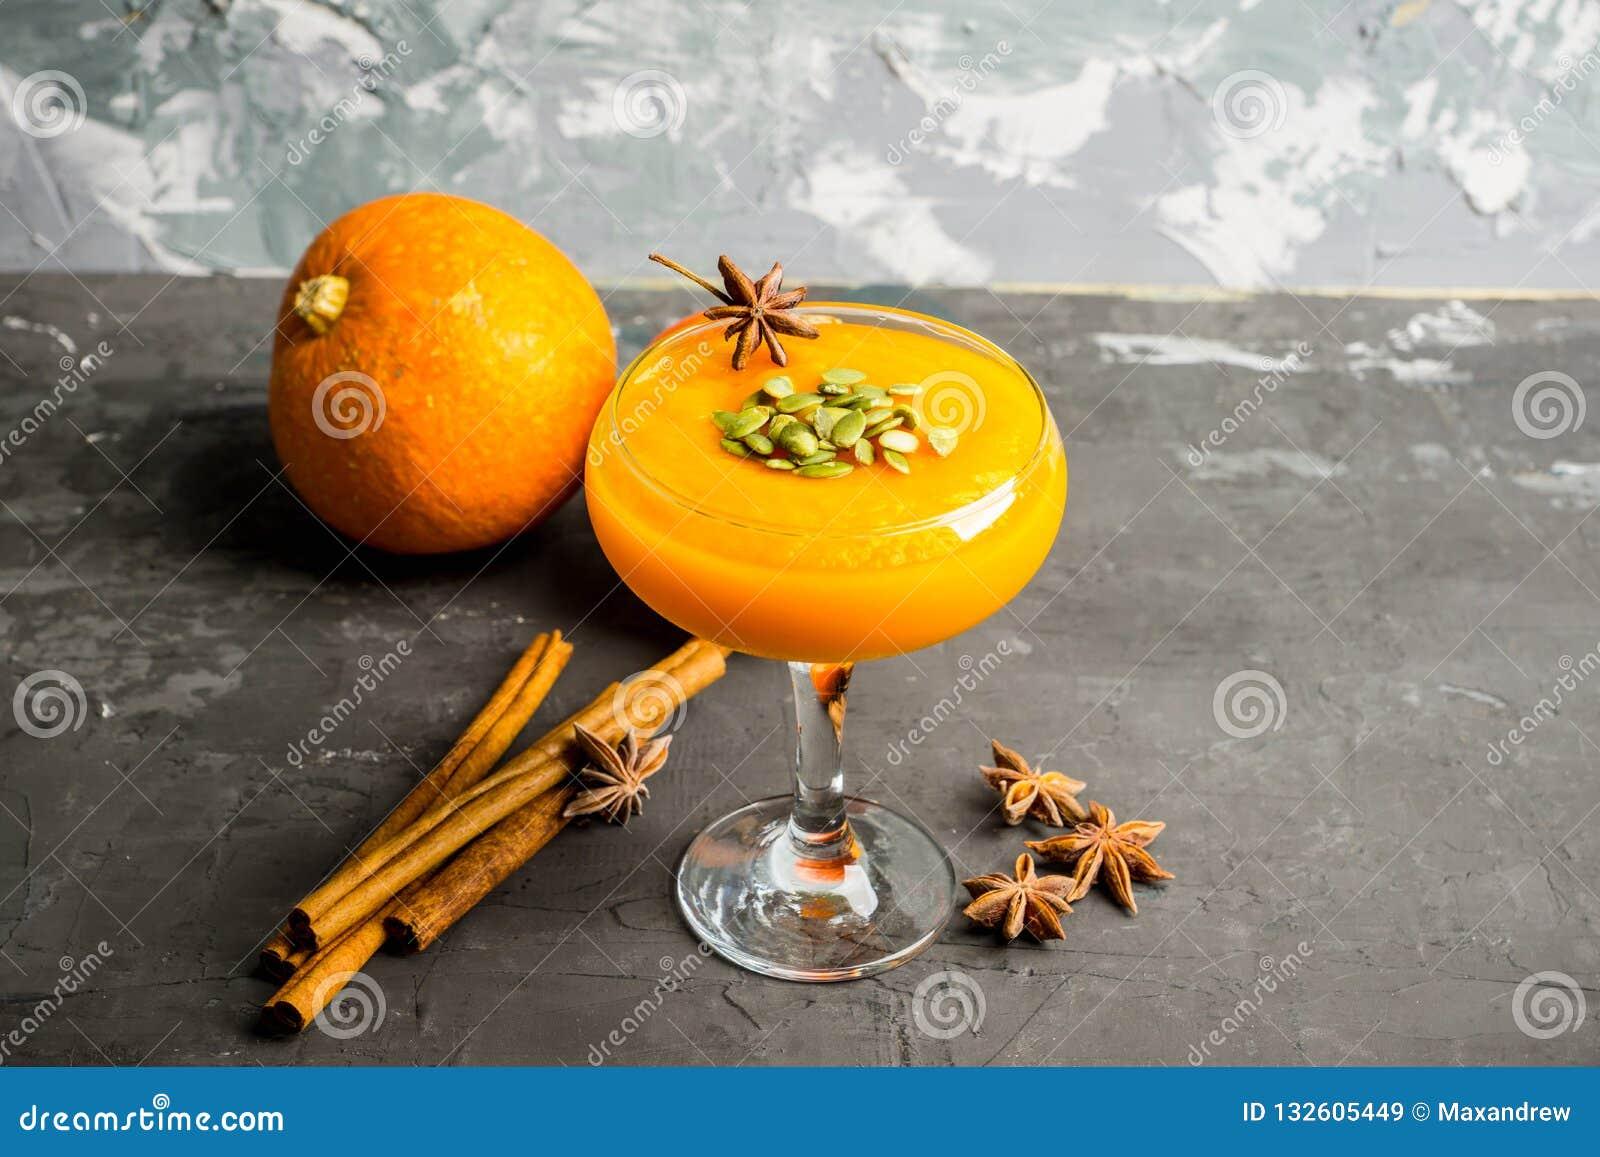 Refreshment and healthy autumn pumpkin drink